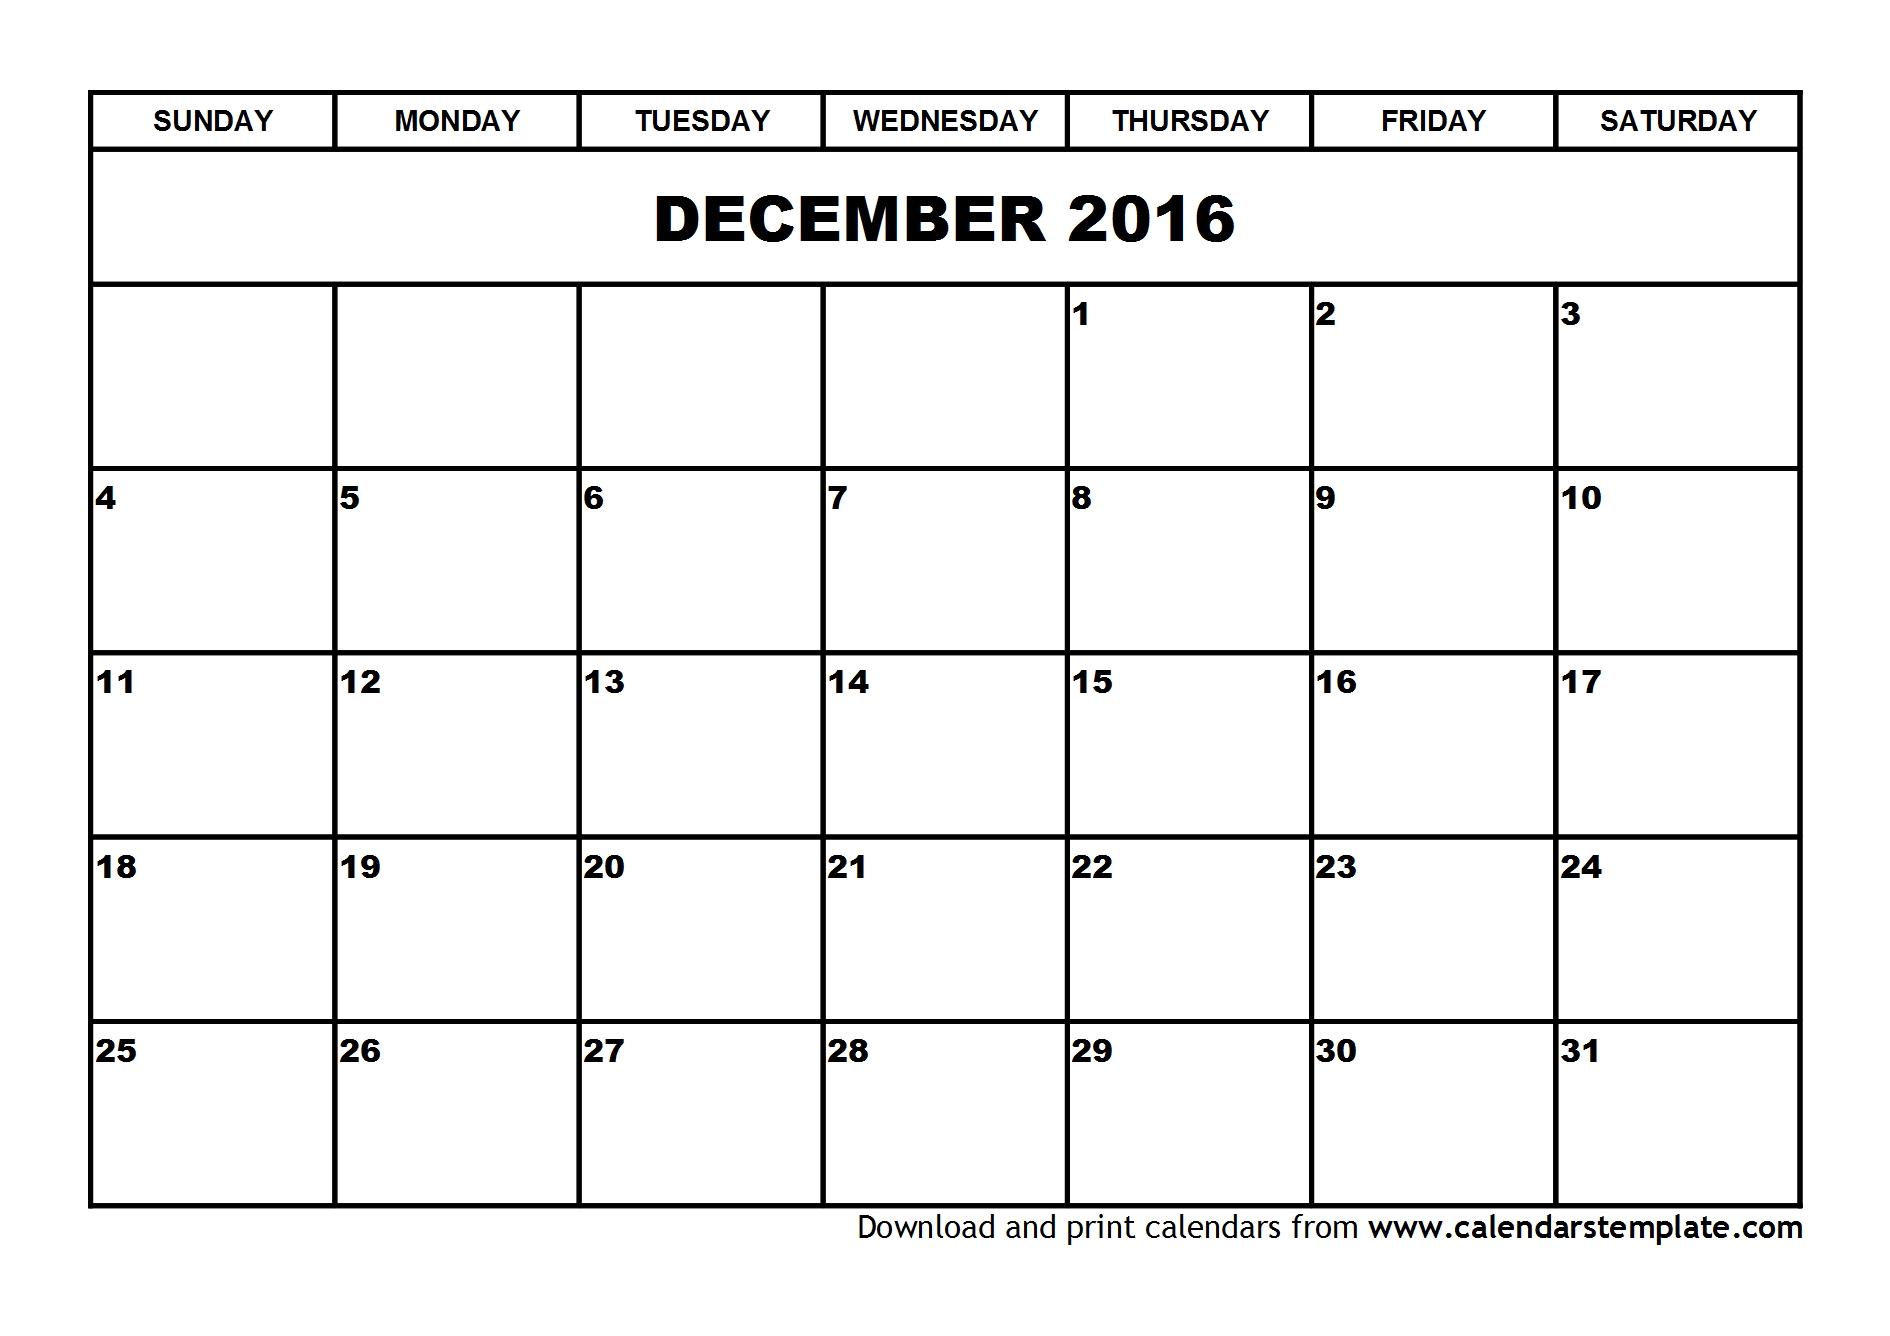 009 Blank Calendar Template Ideas November Printable December Pdf with December Printable Monthly Calendar Templates